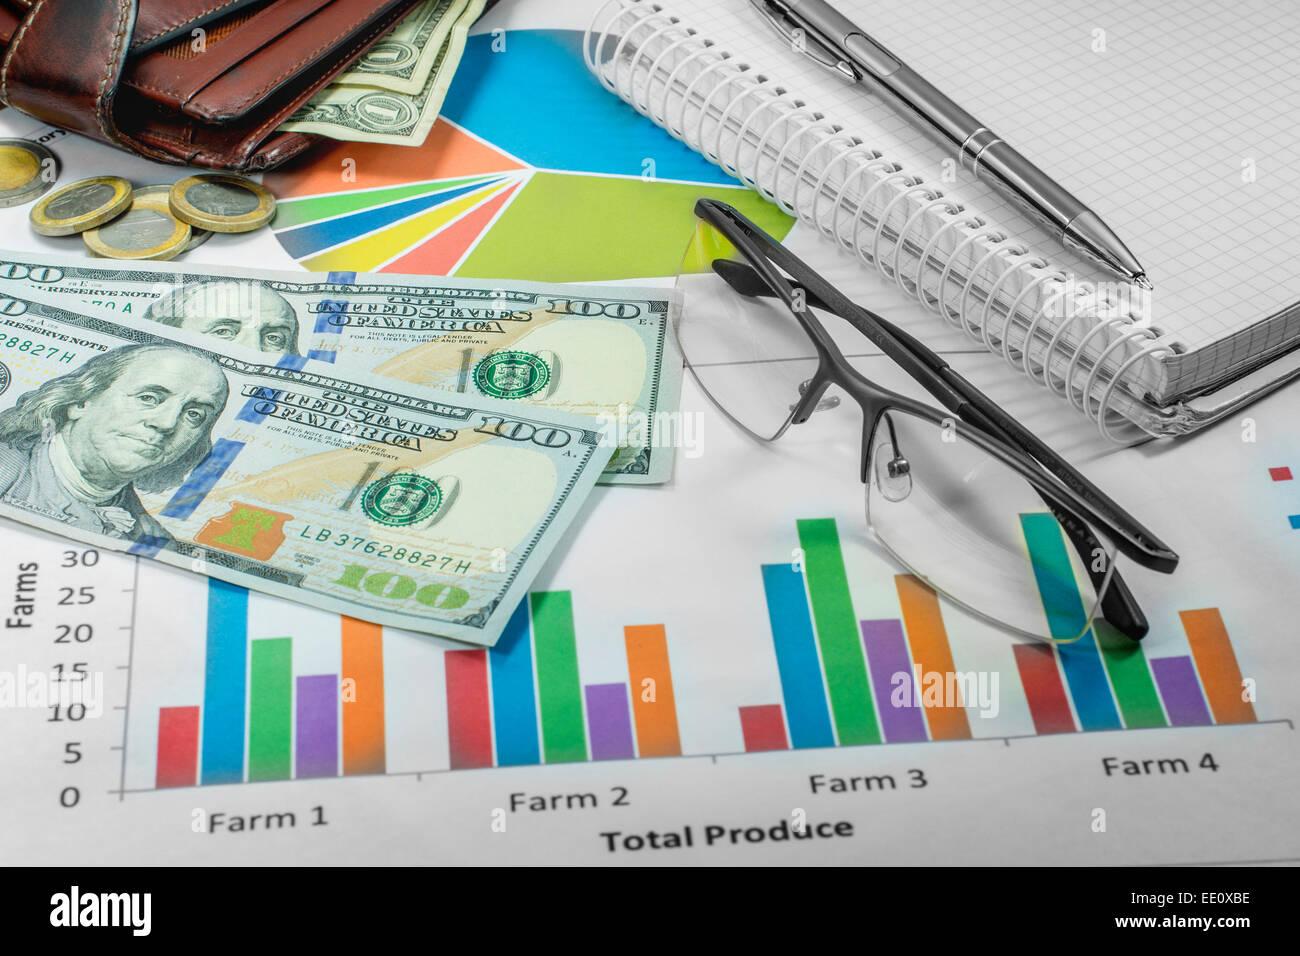 business plan schedules money wallet pen dollar stock